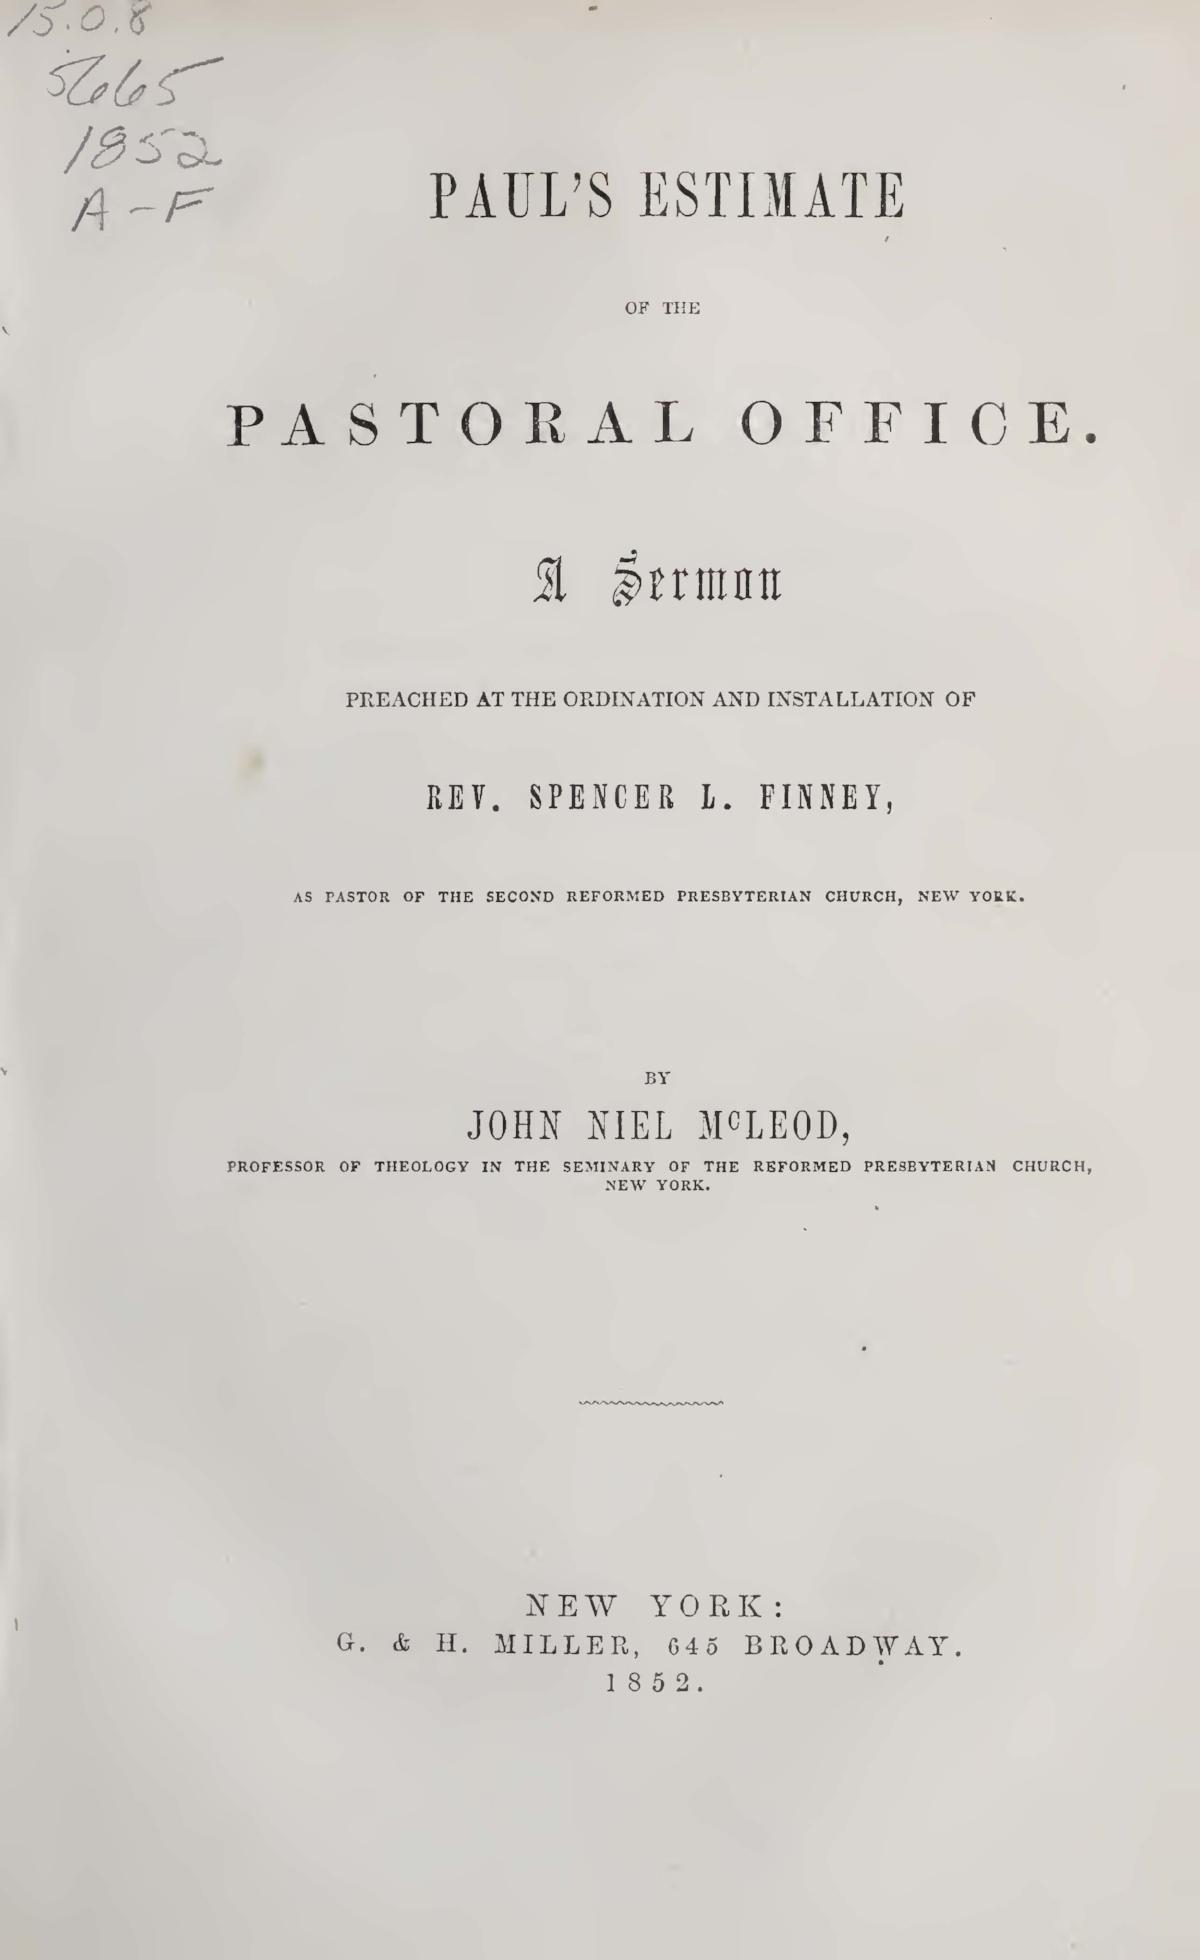 McLeod, John Niel, Paul's Estimate of the Pastoral Office Title Page.jpg